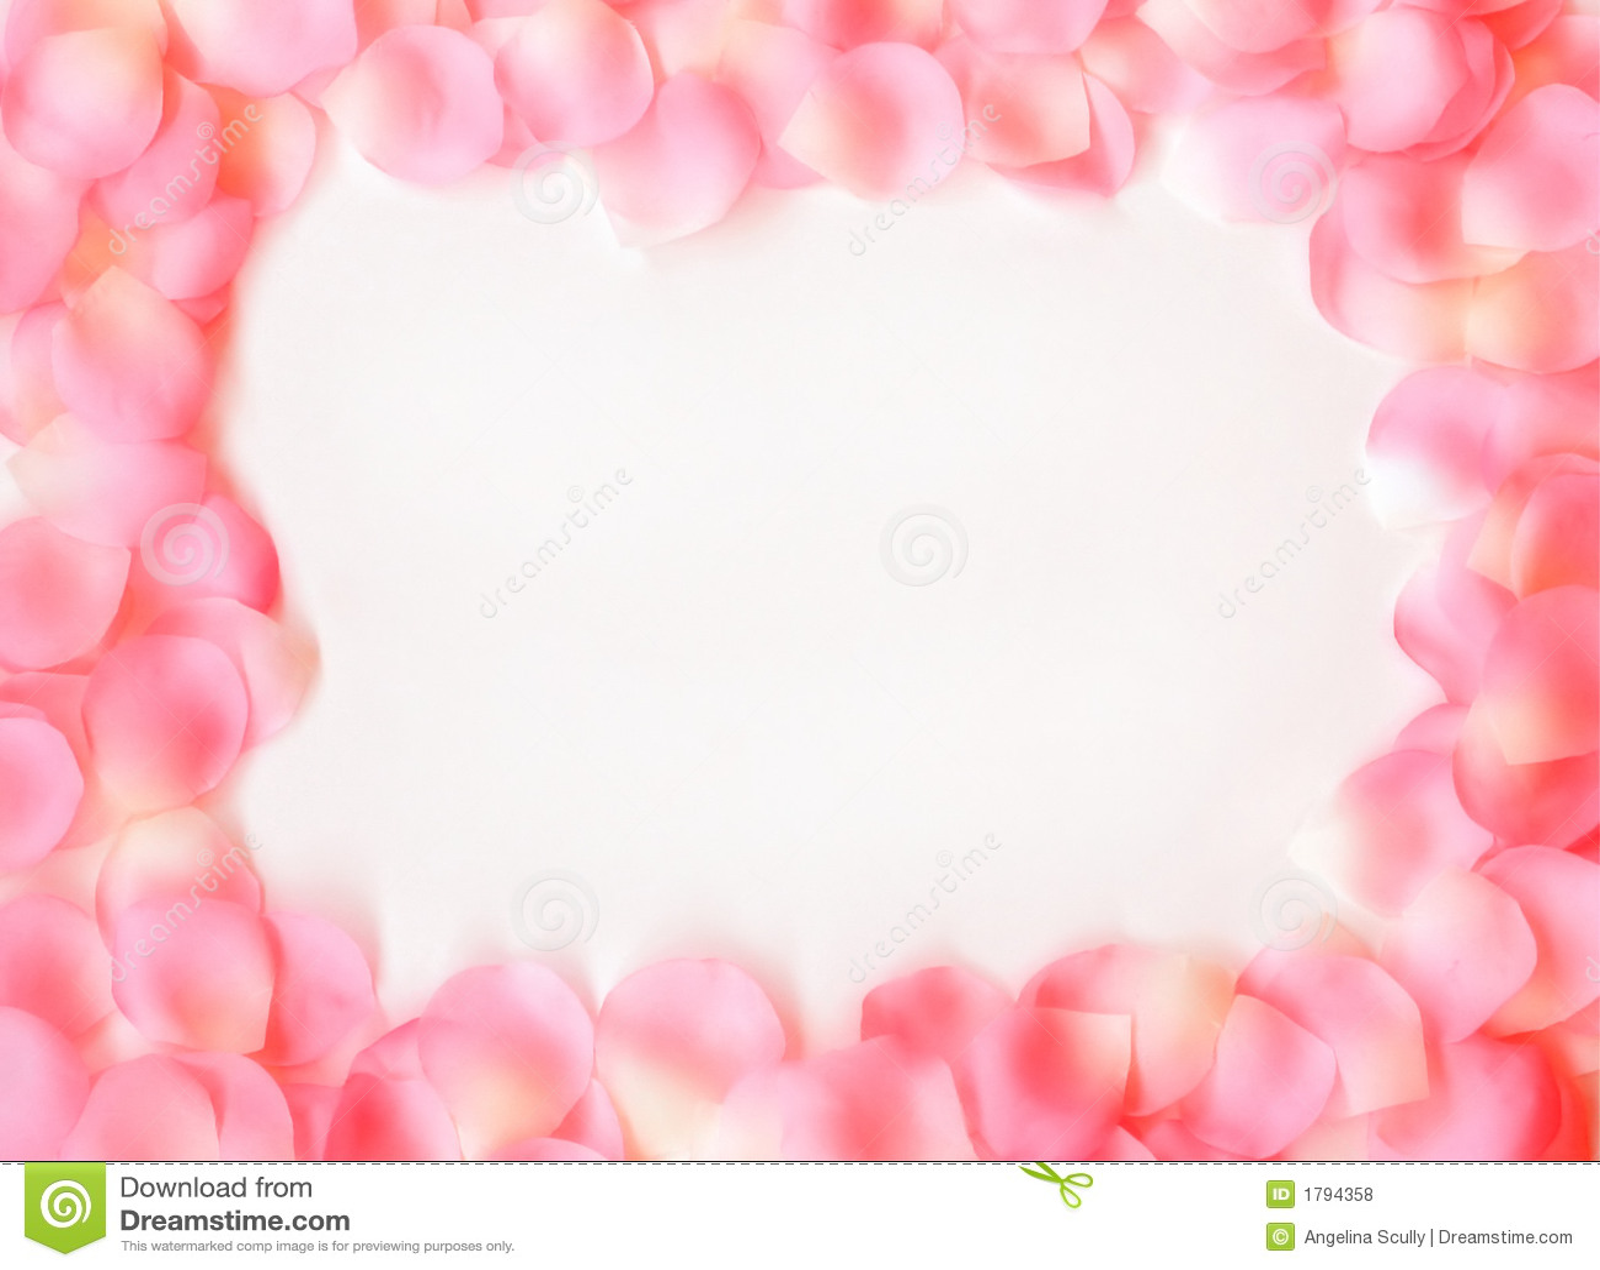 Falling Rose Petals Wallpaper Dreamy Rose Petal Frame Stock Photo Image Of Frame